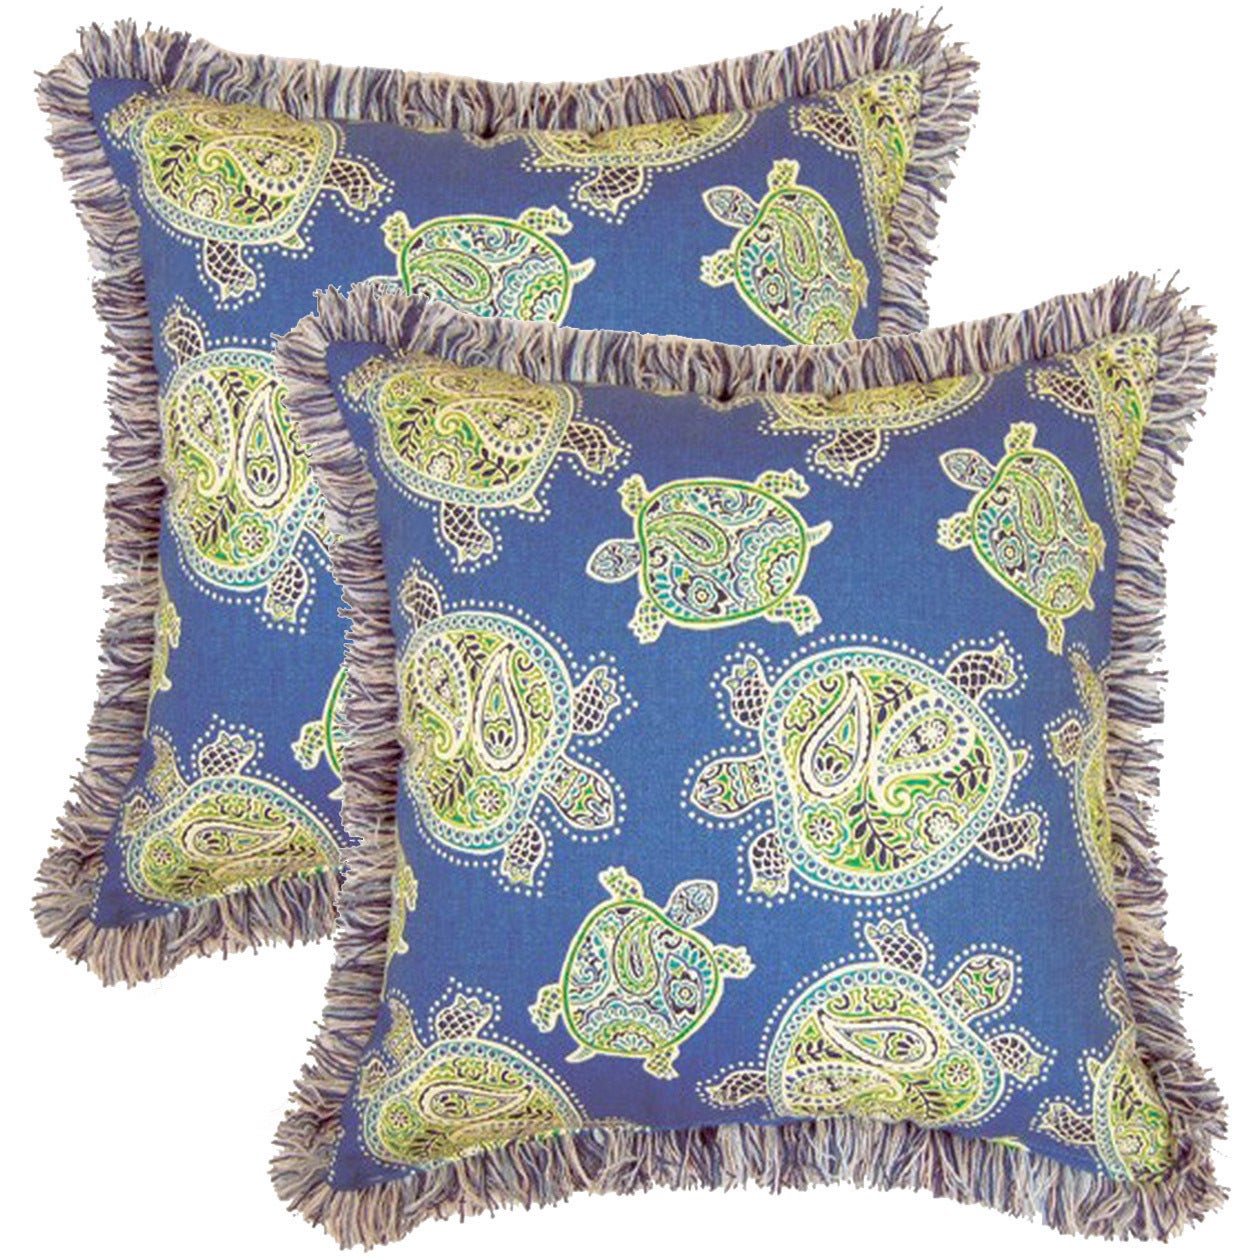 Creative Tranquil Turtles Ocean 17-inch Throw Pillows (Se...